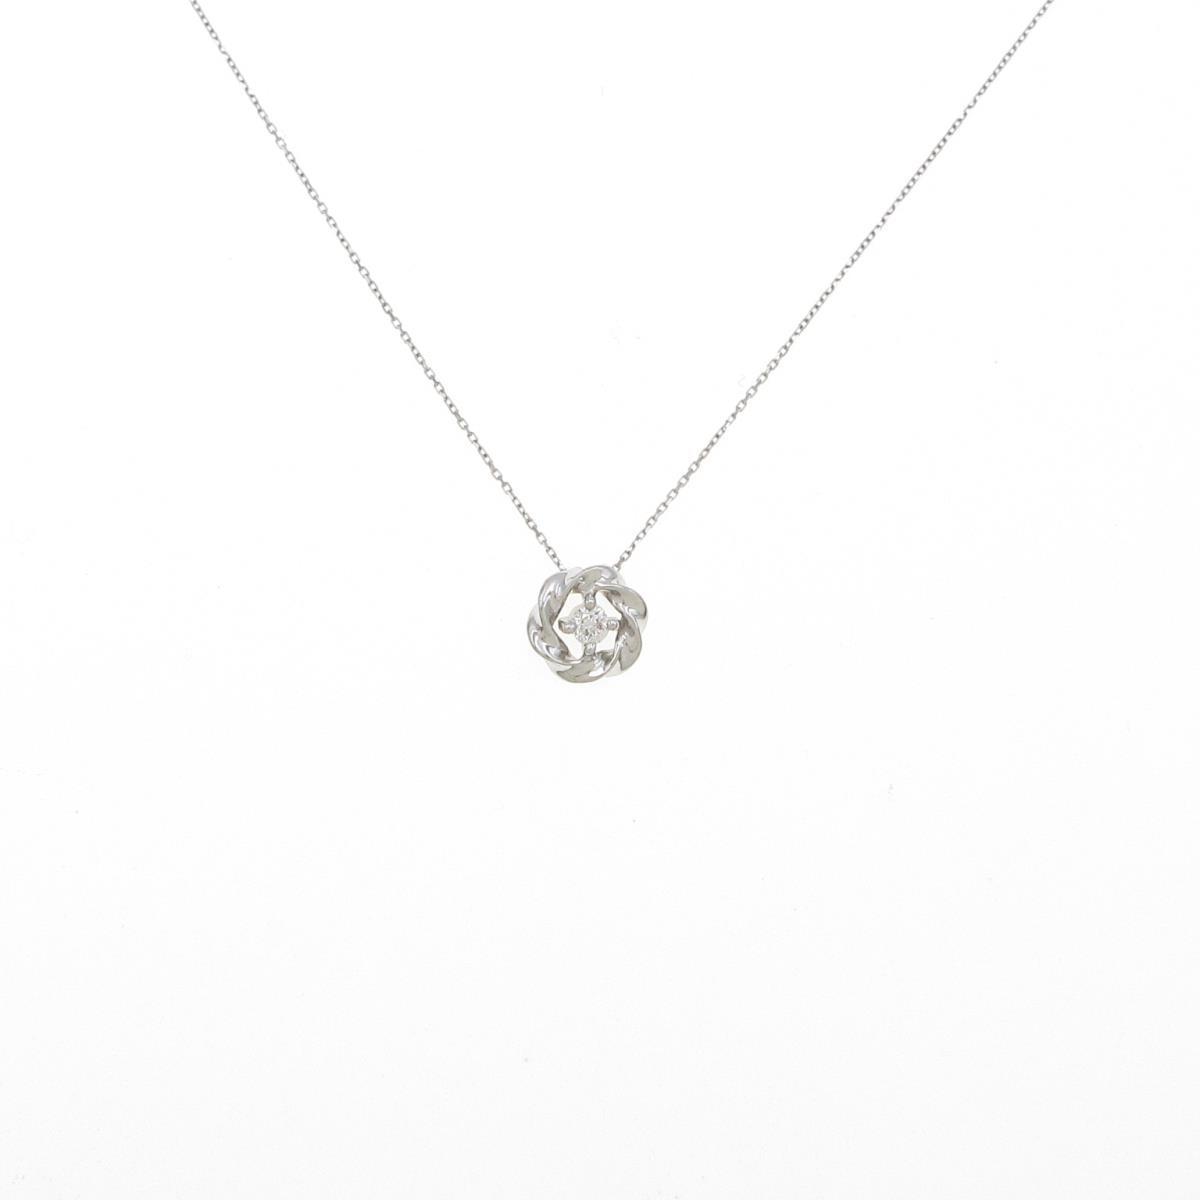 PT 卸売り フラワー ダイヤモンドネックレス 日本正規品 中古